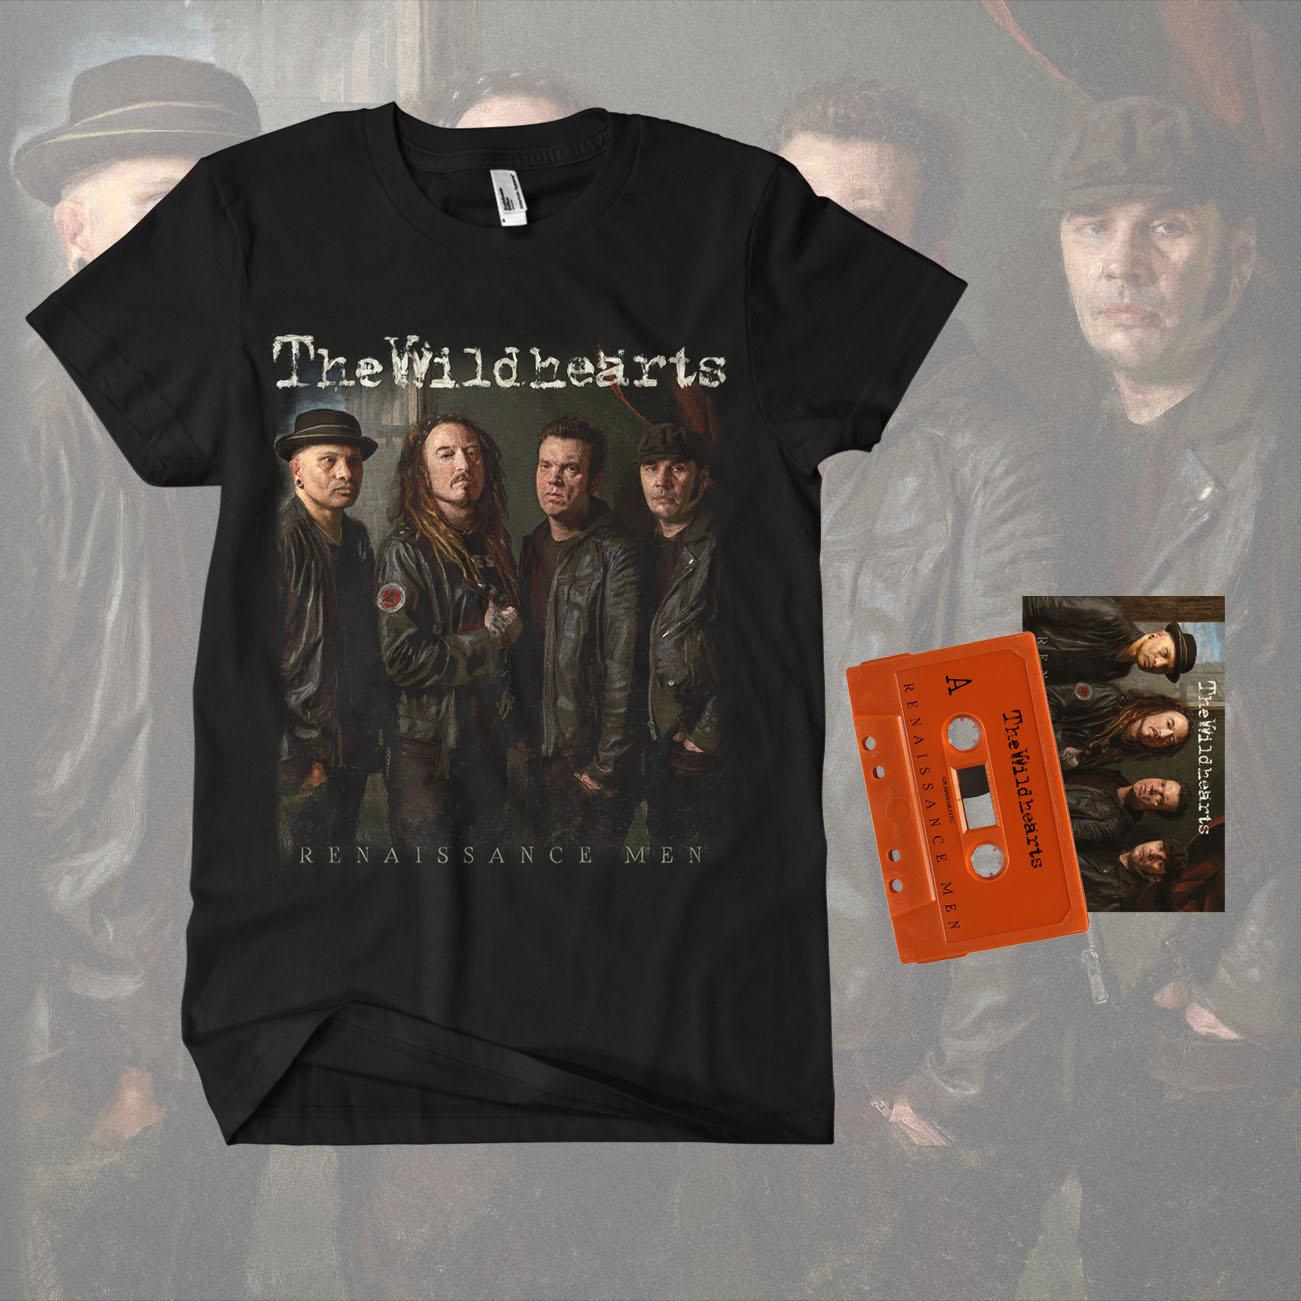 The Wildhearts - 'Renaissance Men' Limited Edition Cassette Tape & T-Shirt Bundle - The Wildhearts